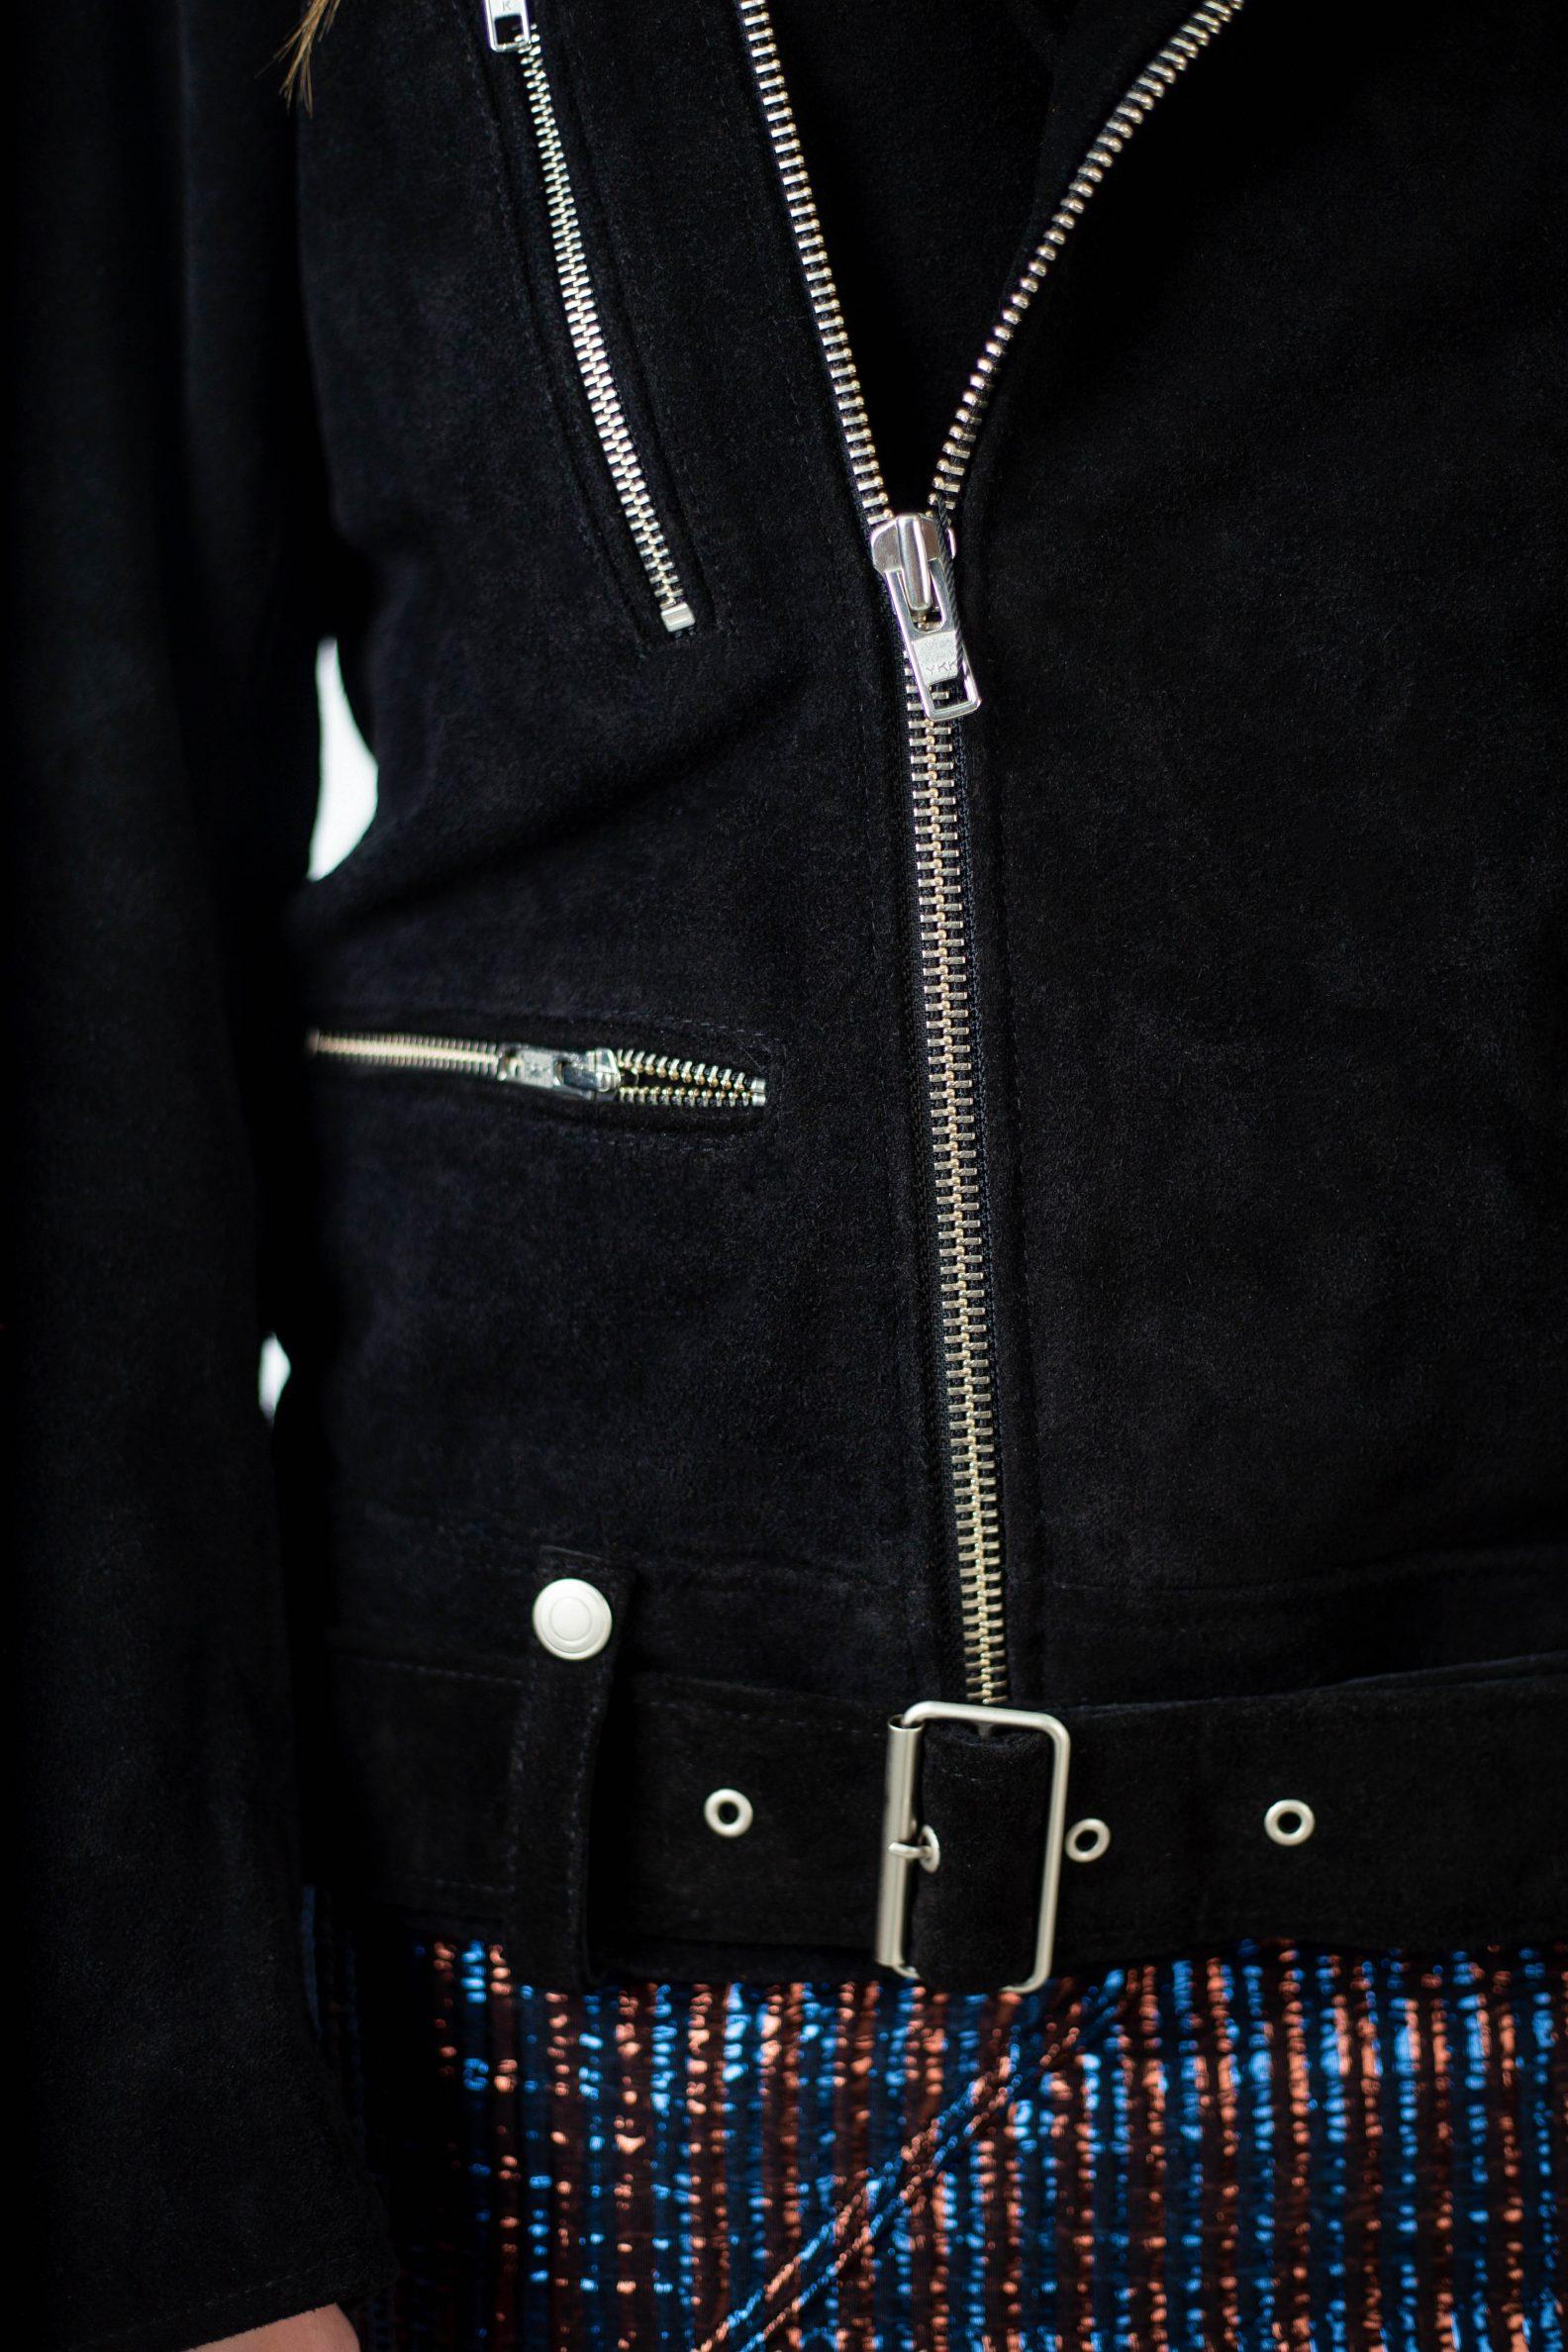 4-perfecto-zip-bouton-daim-affaires-etrangeres-mode-coreenne